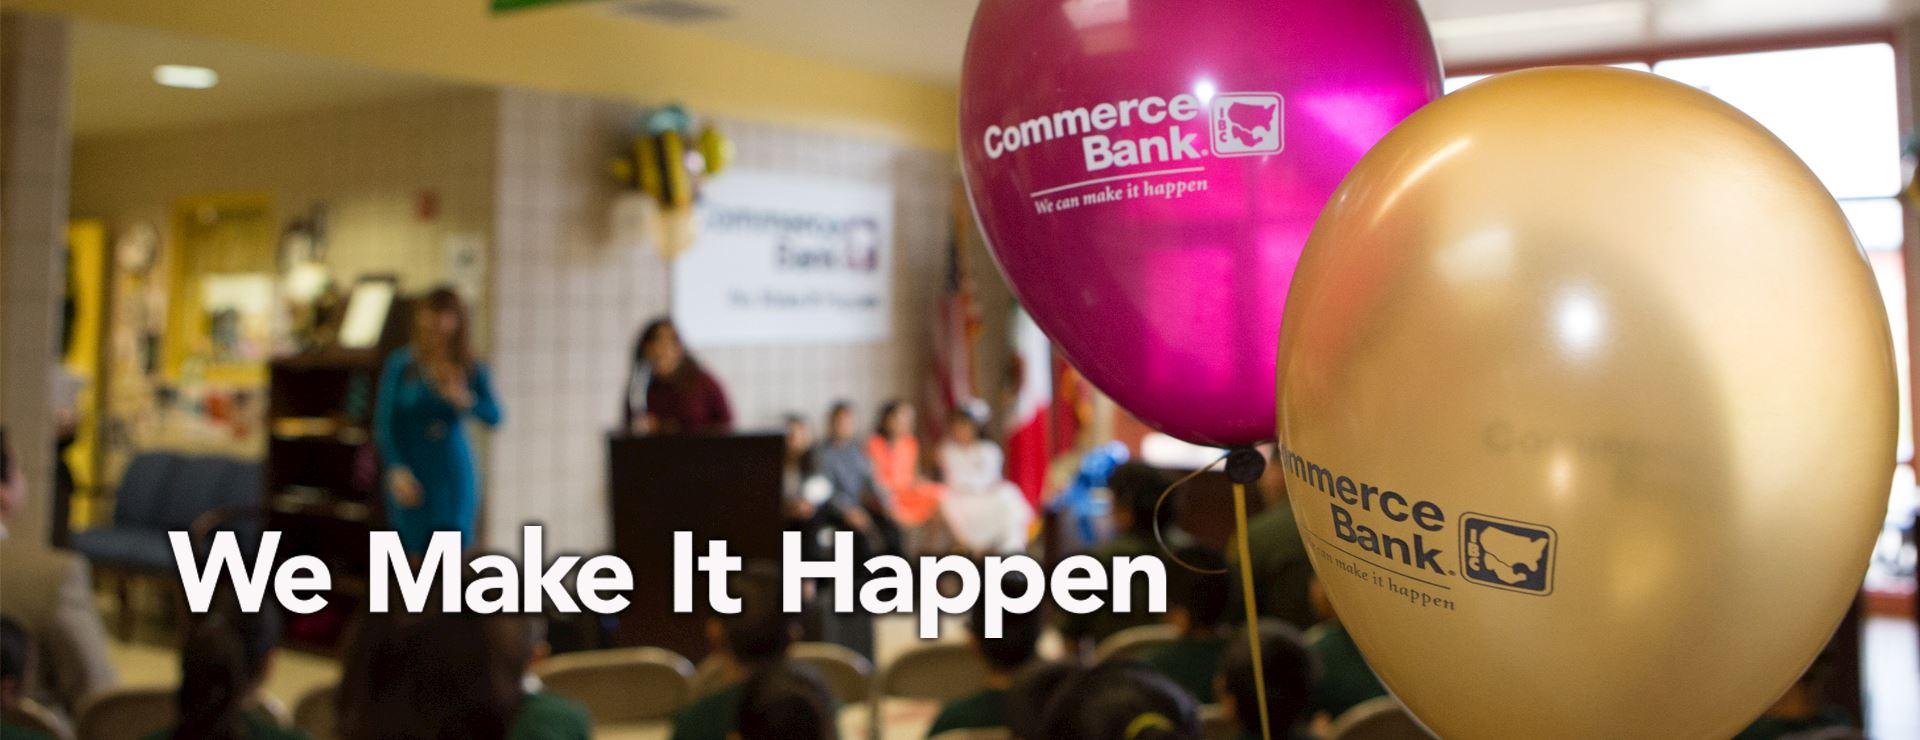 commerce-bank-image3